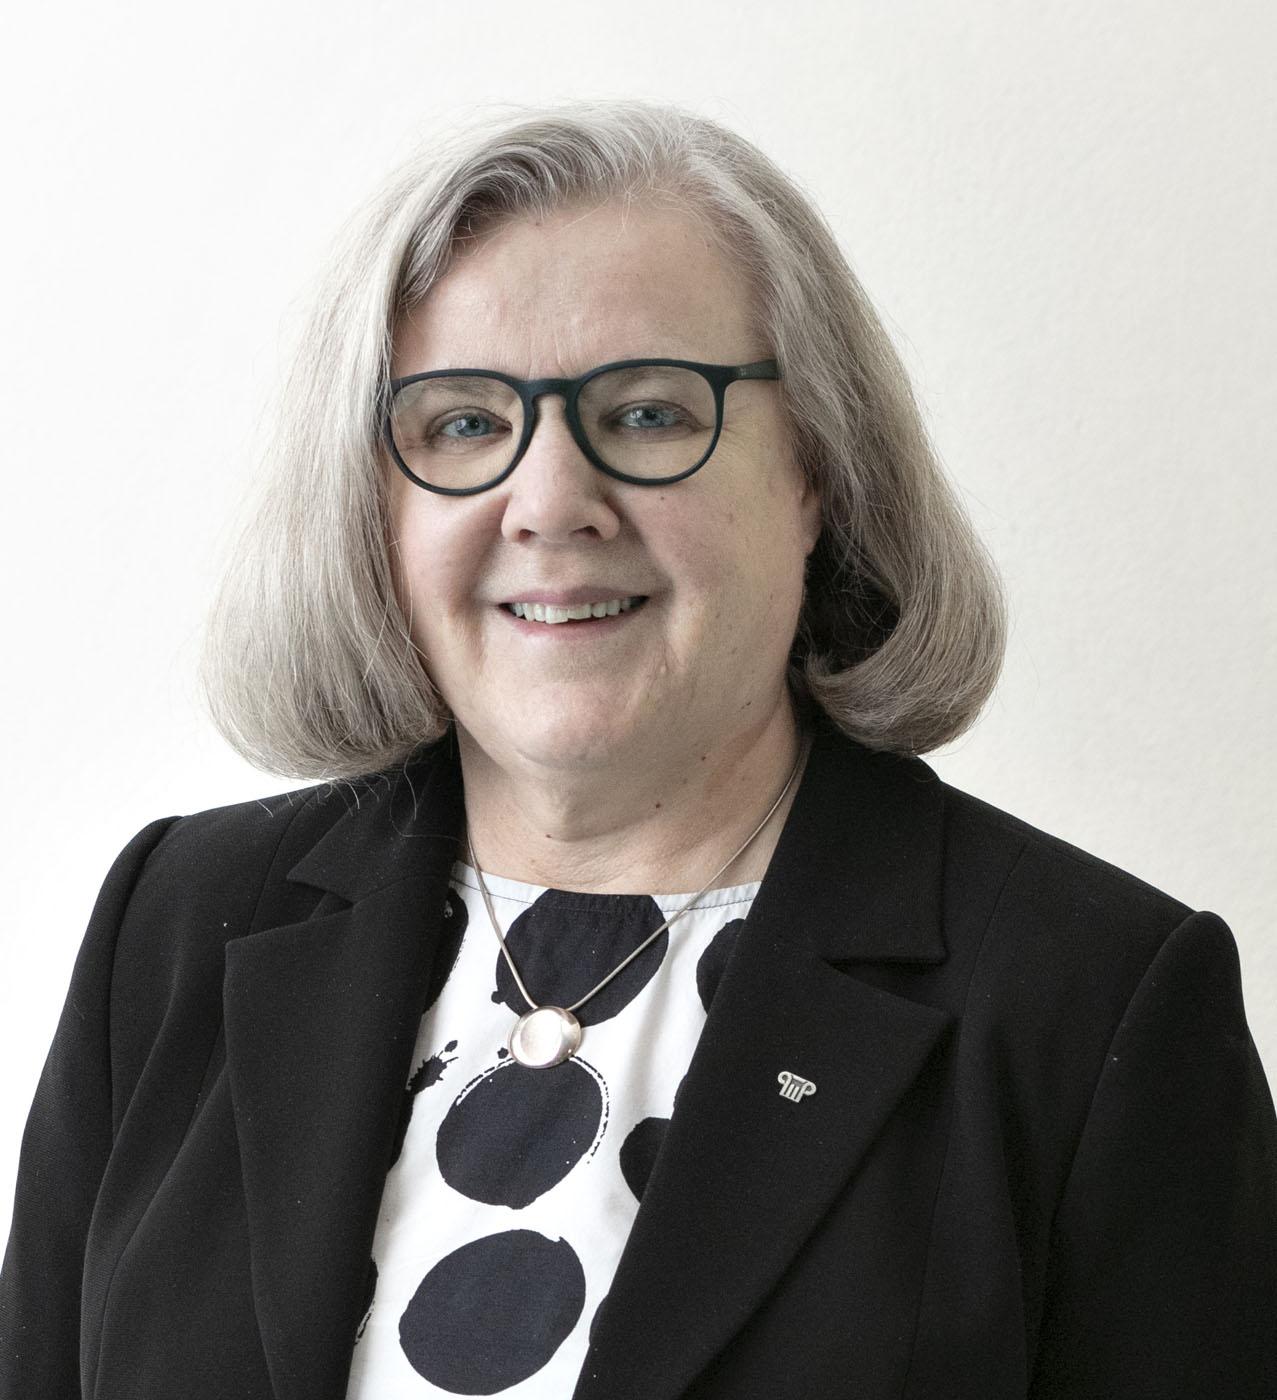 Ordförare Riitta Keiski